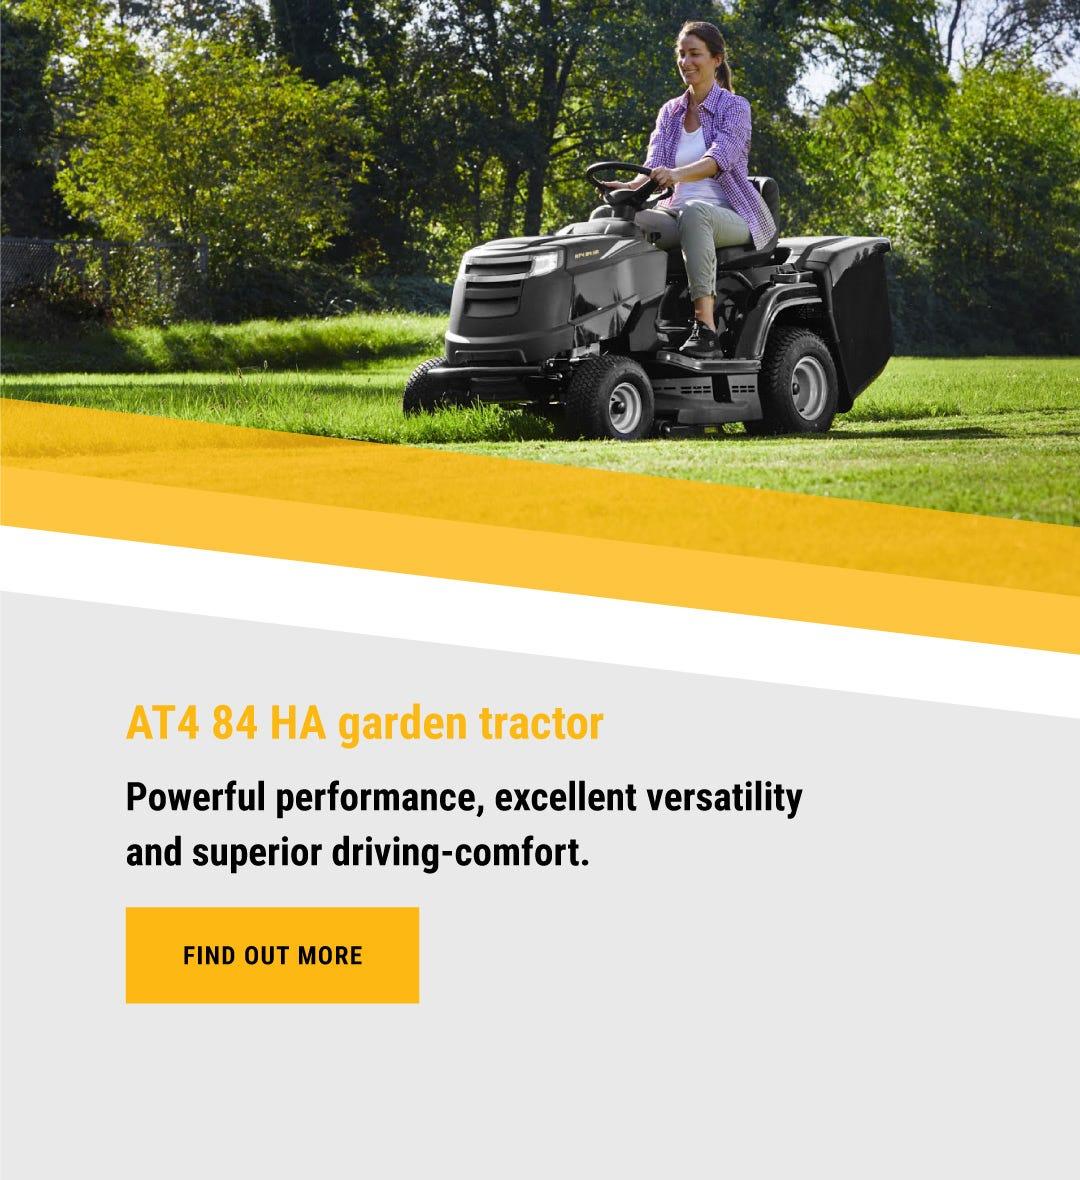 ALPINA AT4 84 HA garden tractor